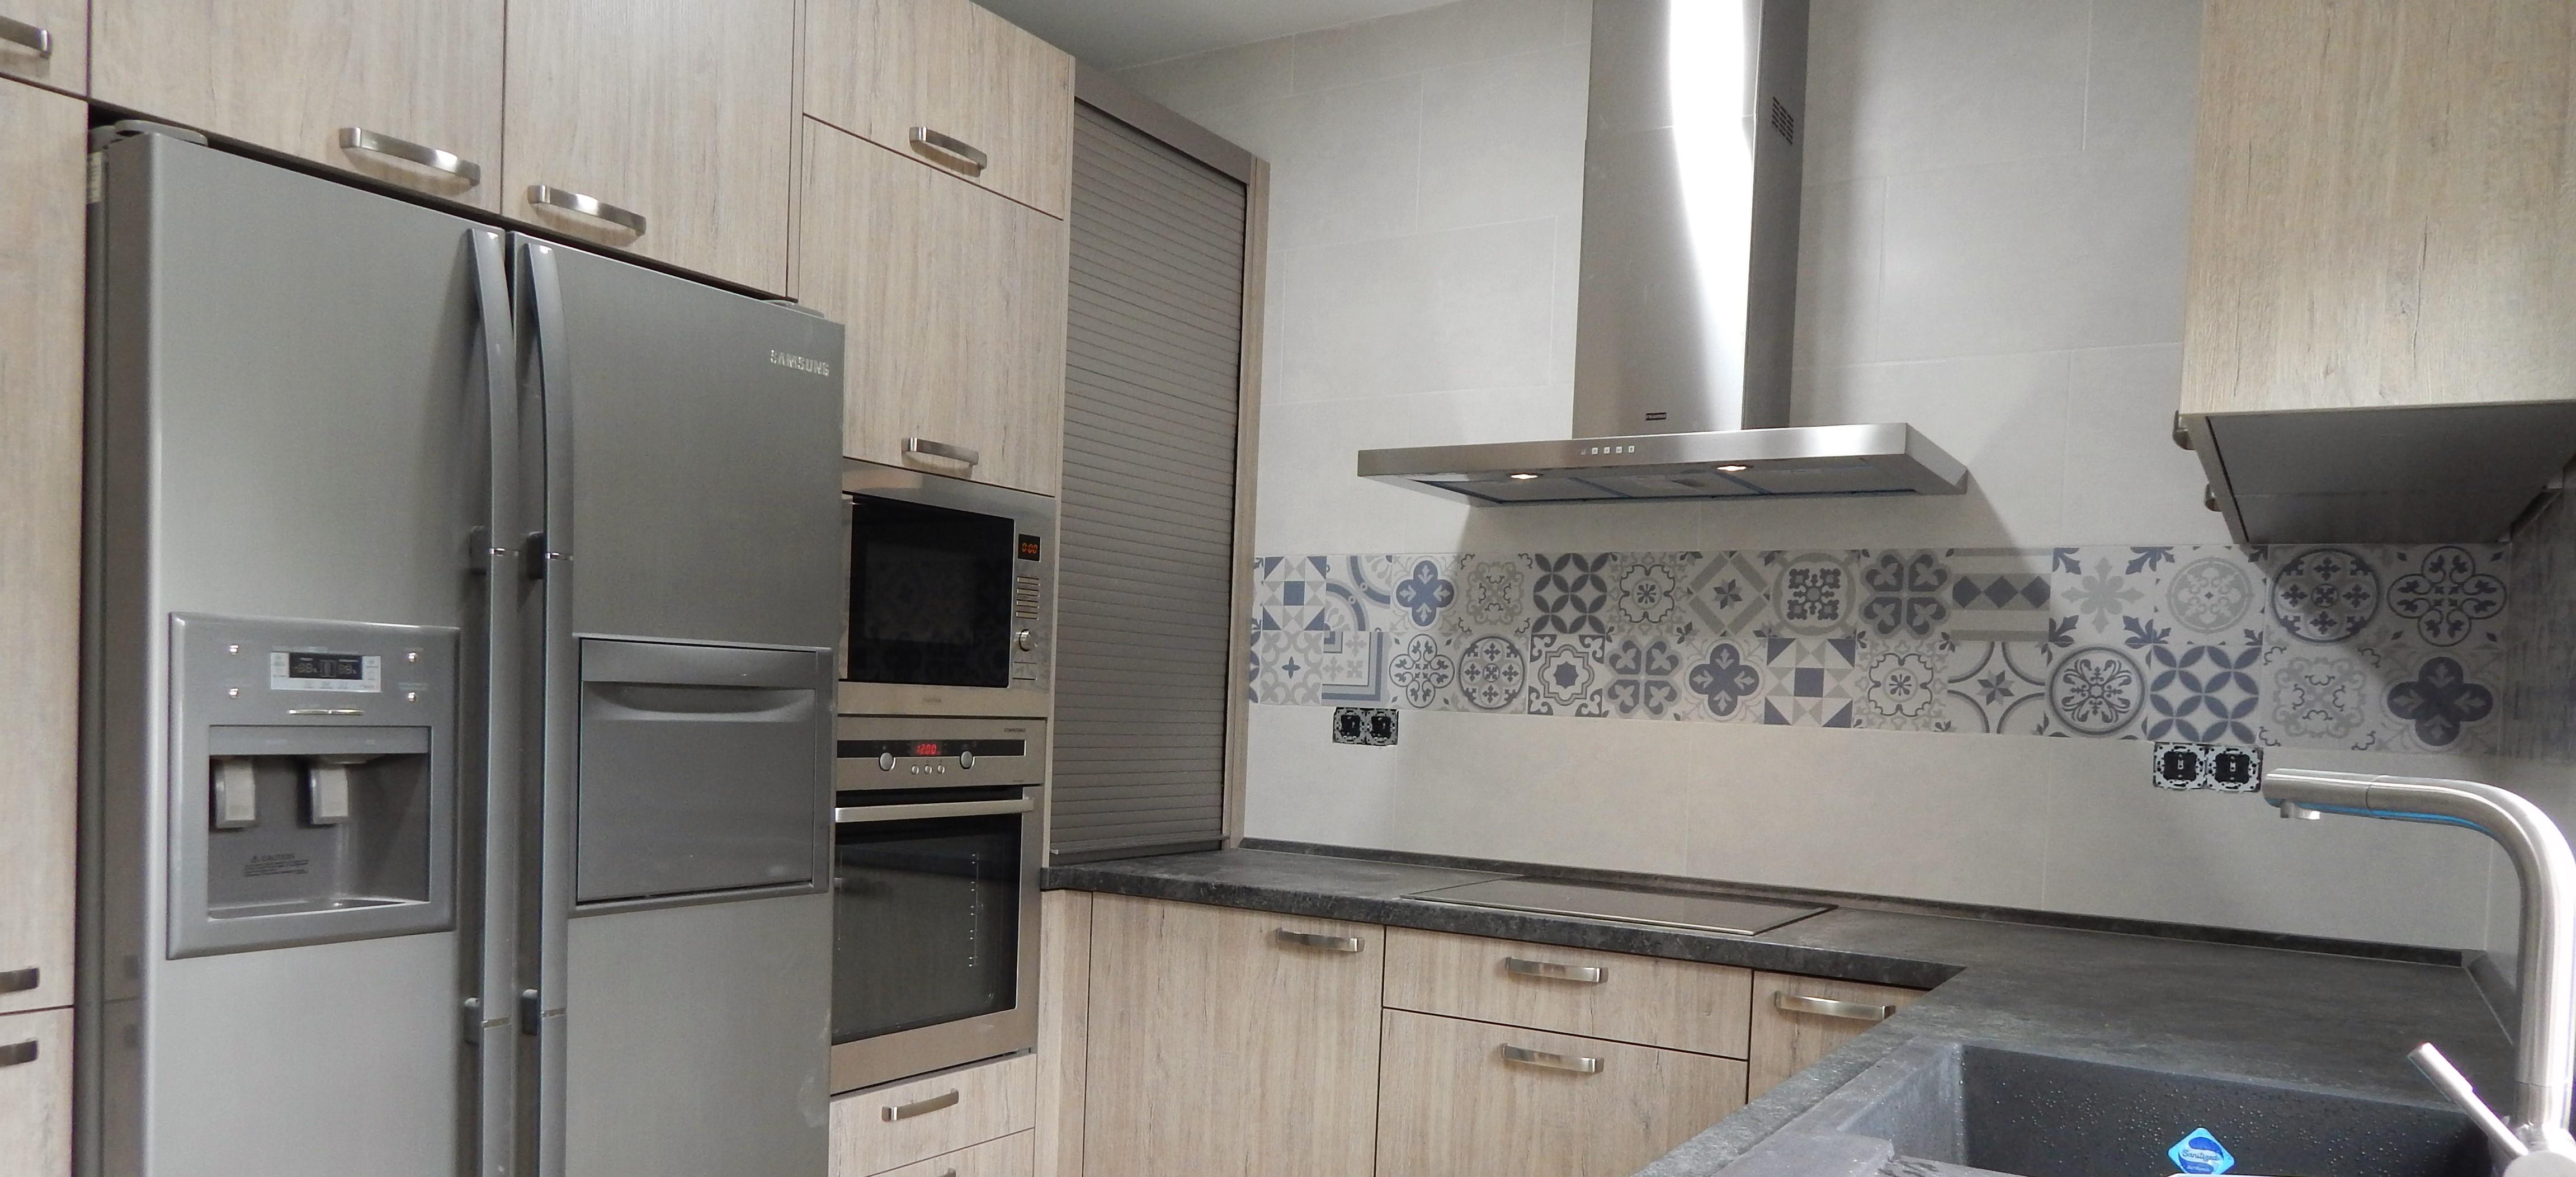 Muebles de cocina roble gris seda for Muebles color roble